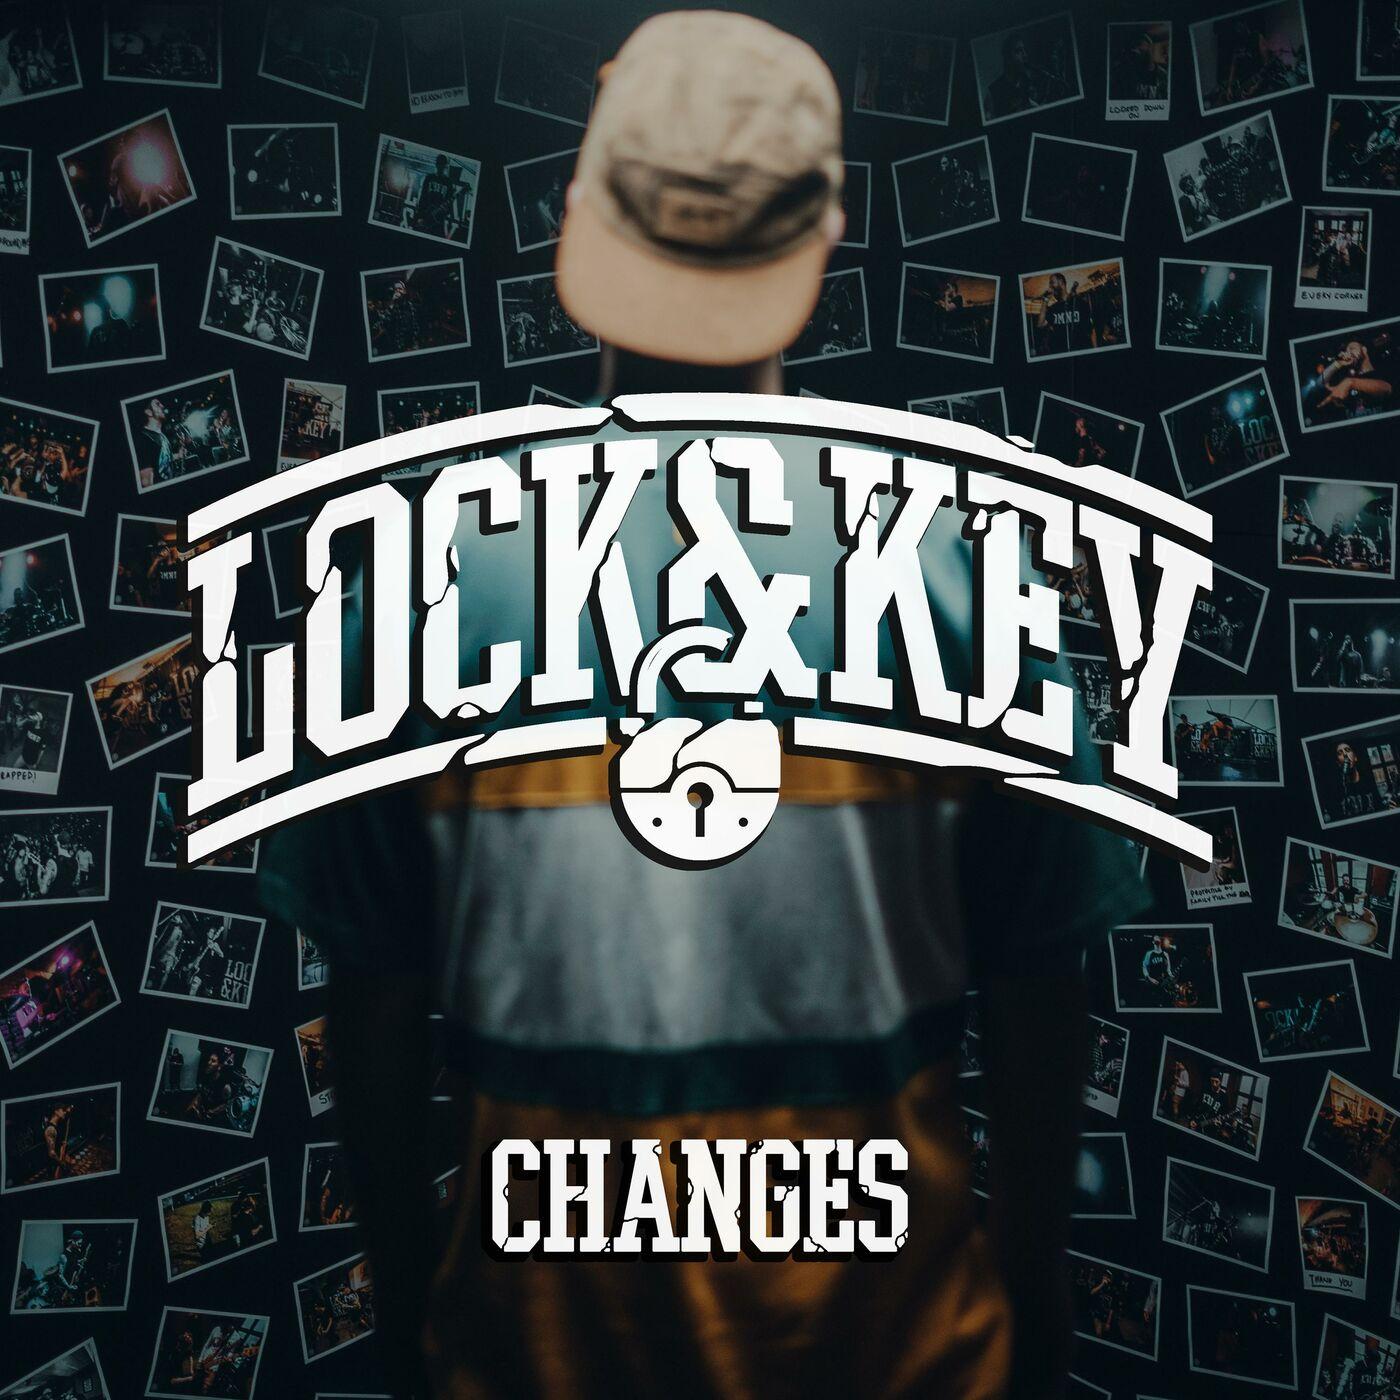 Lock & Key - Changes [single] (2019)